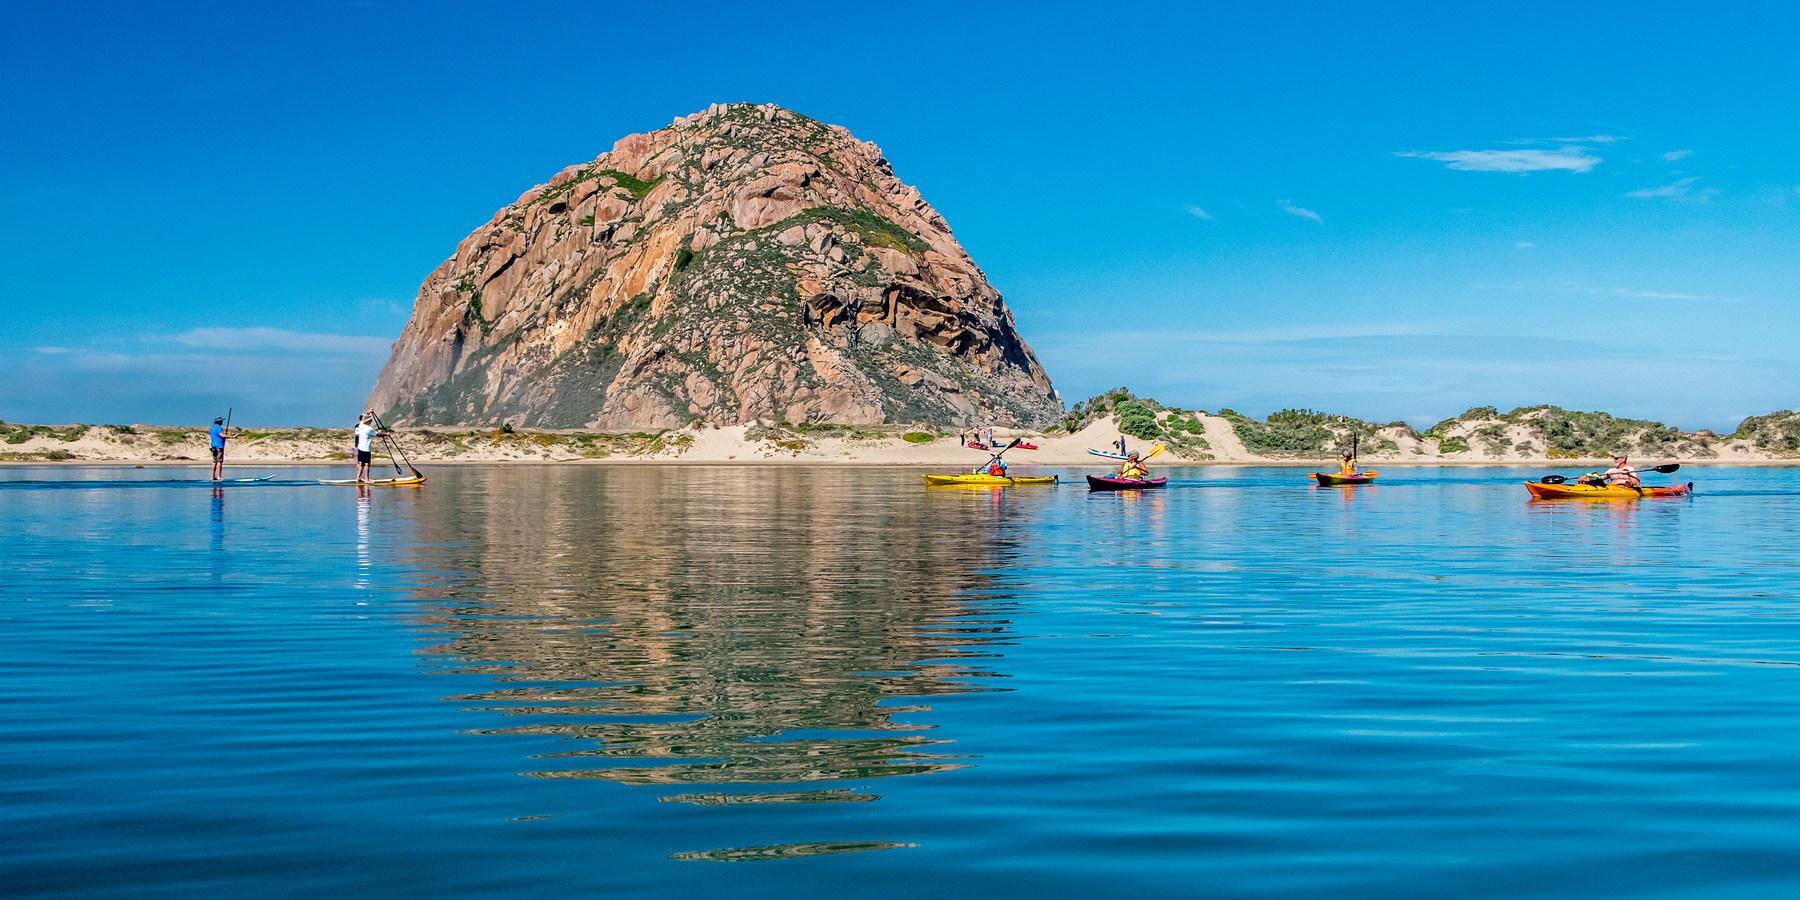 Isla El Morro - Wikipedia